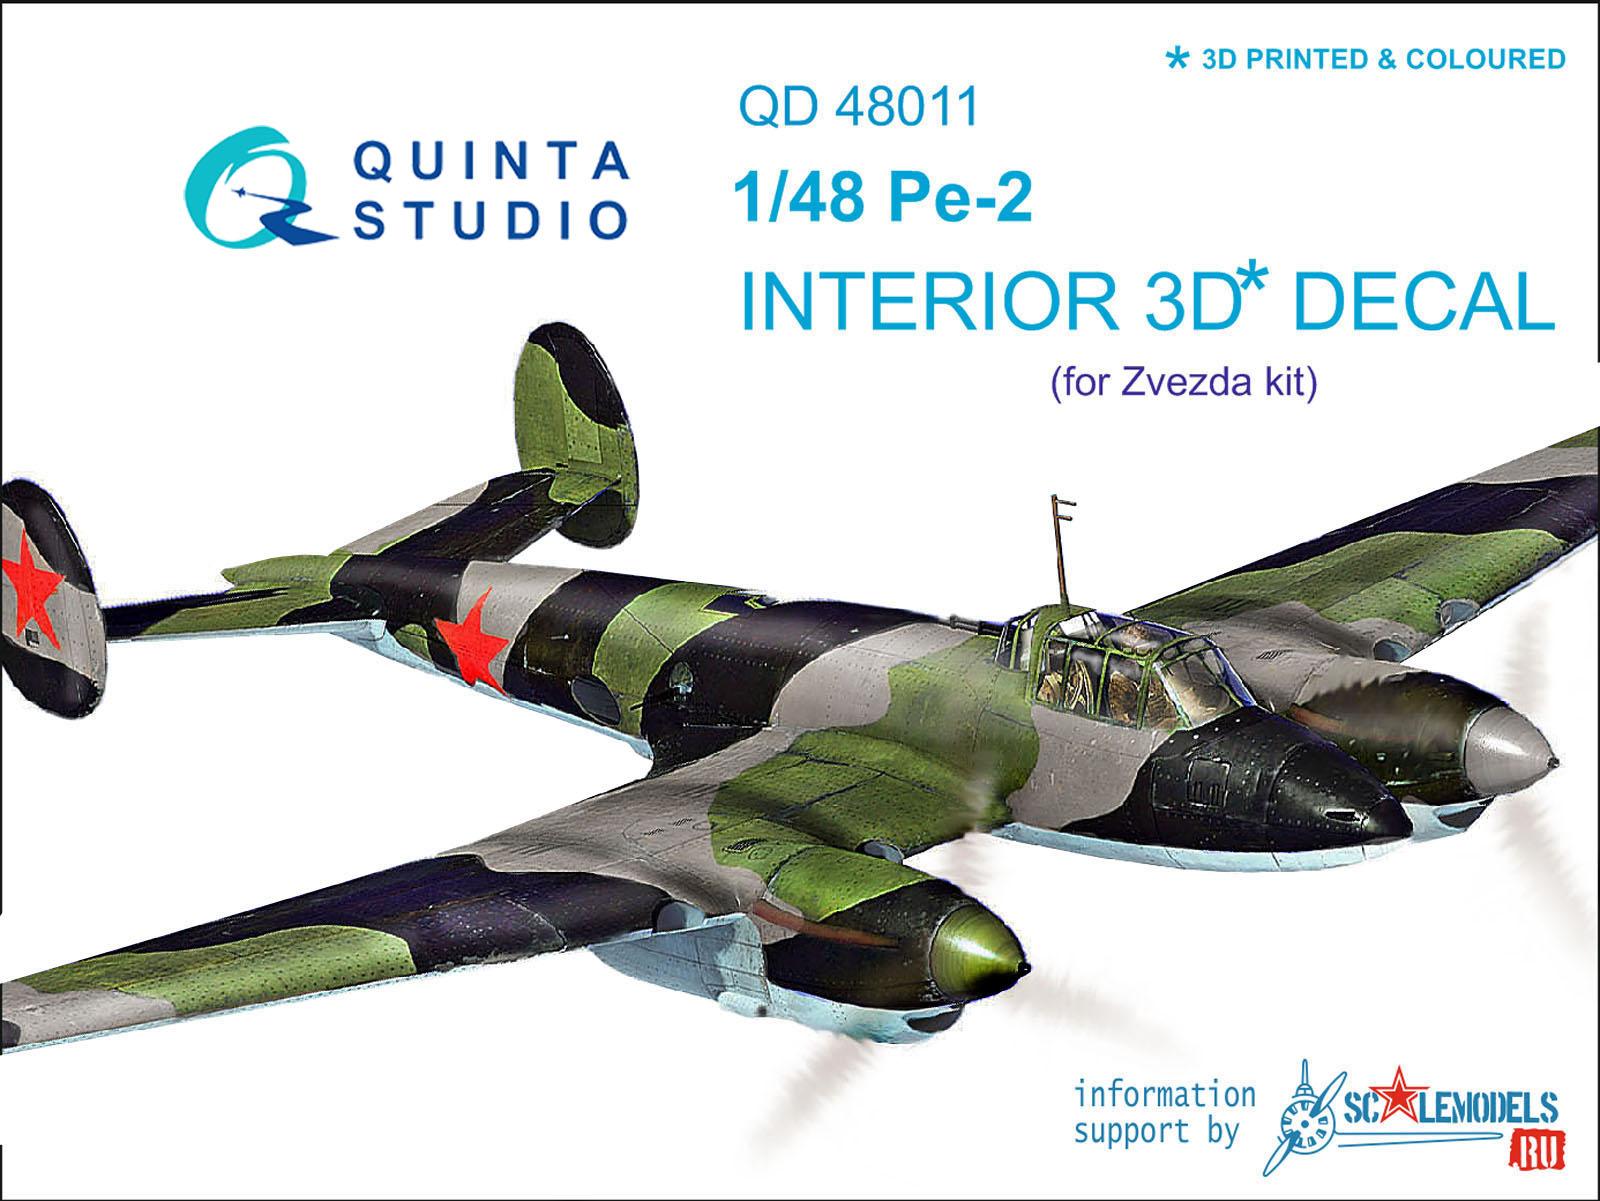 QD48011